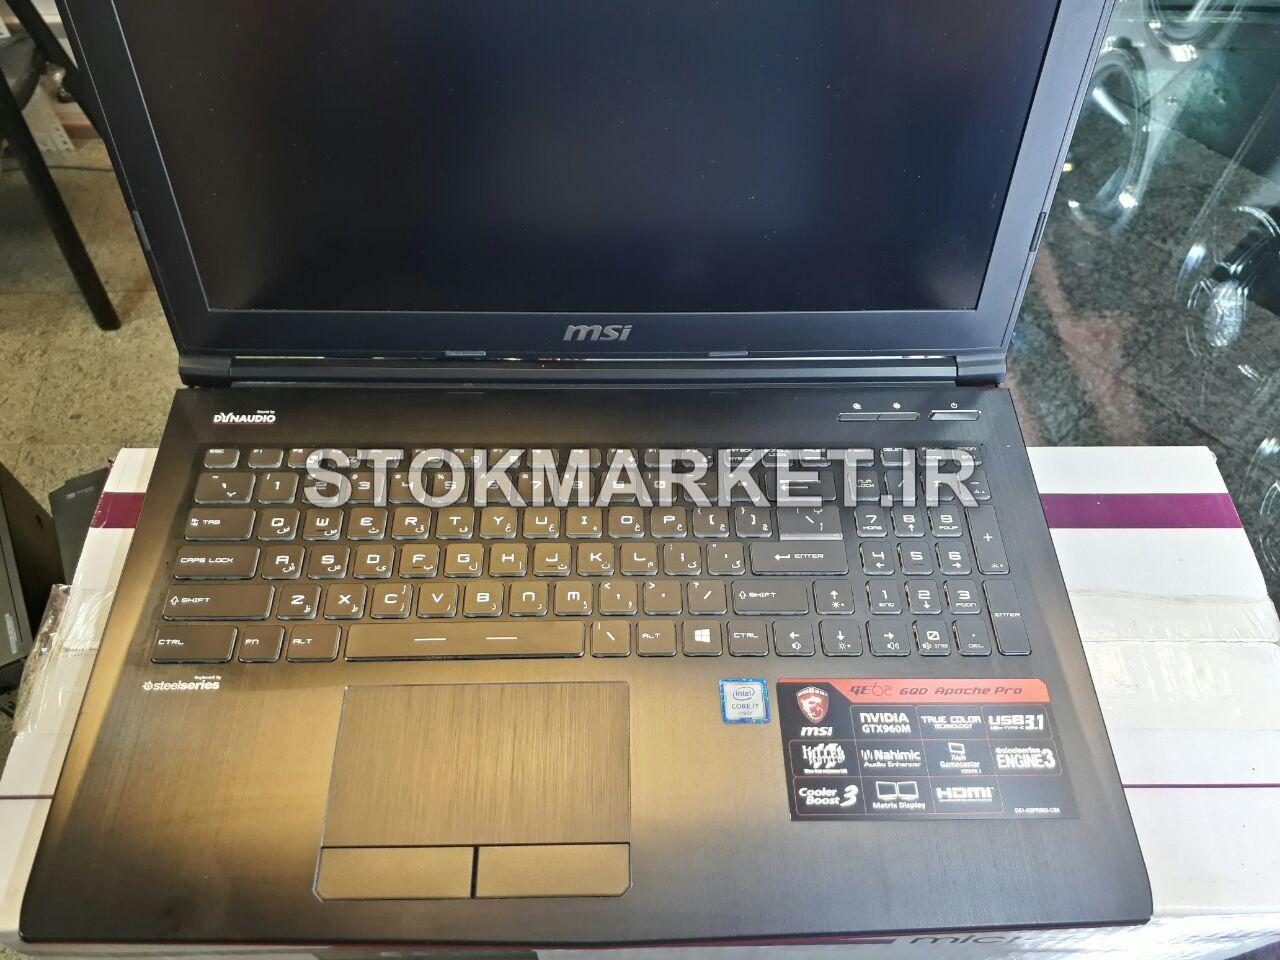 لپ تاپ اپن باکس ام اس ای مدل Msi ge62 6qd apach